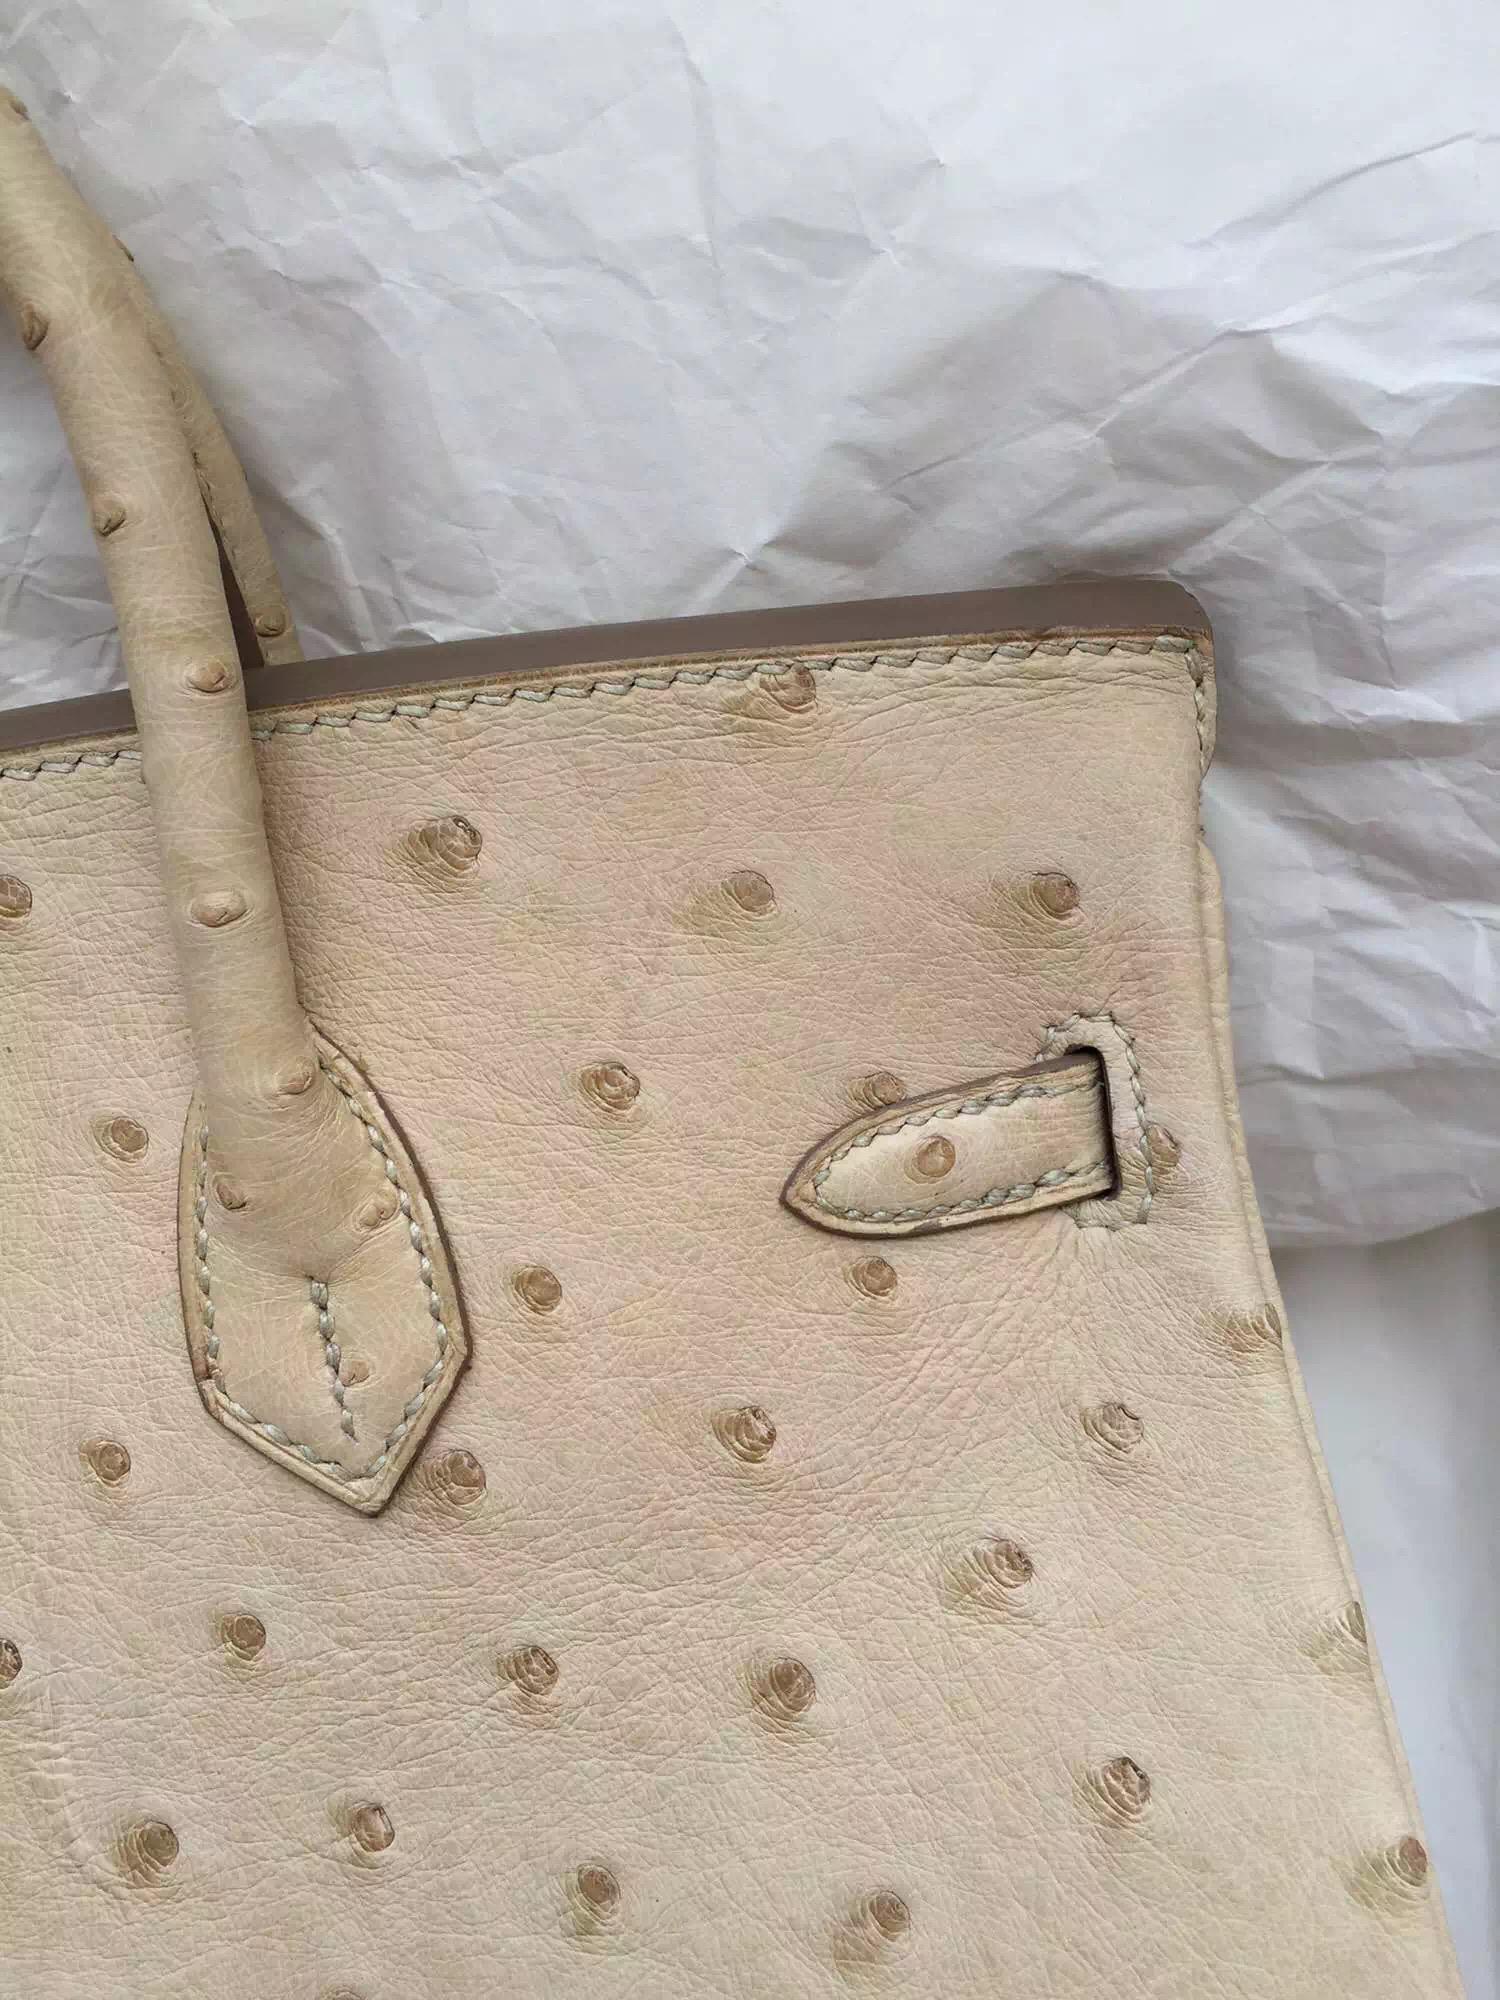 Sale 1F Beige Color Ostrich Leather Hermes Birkin Bag 25CM Women's Handbag